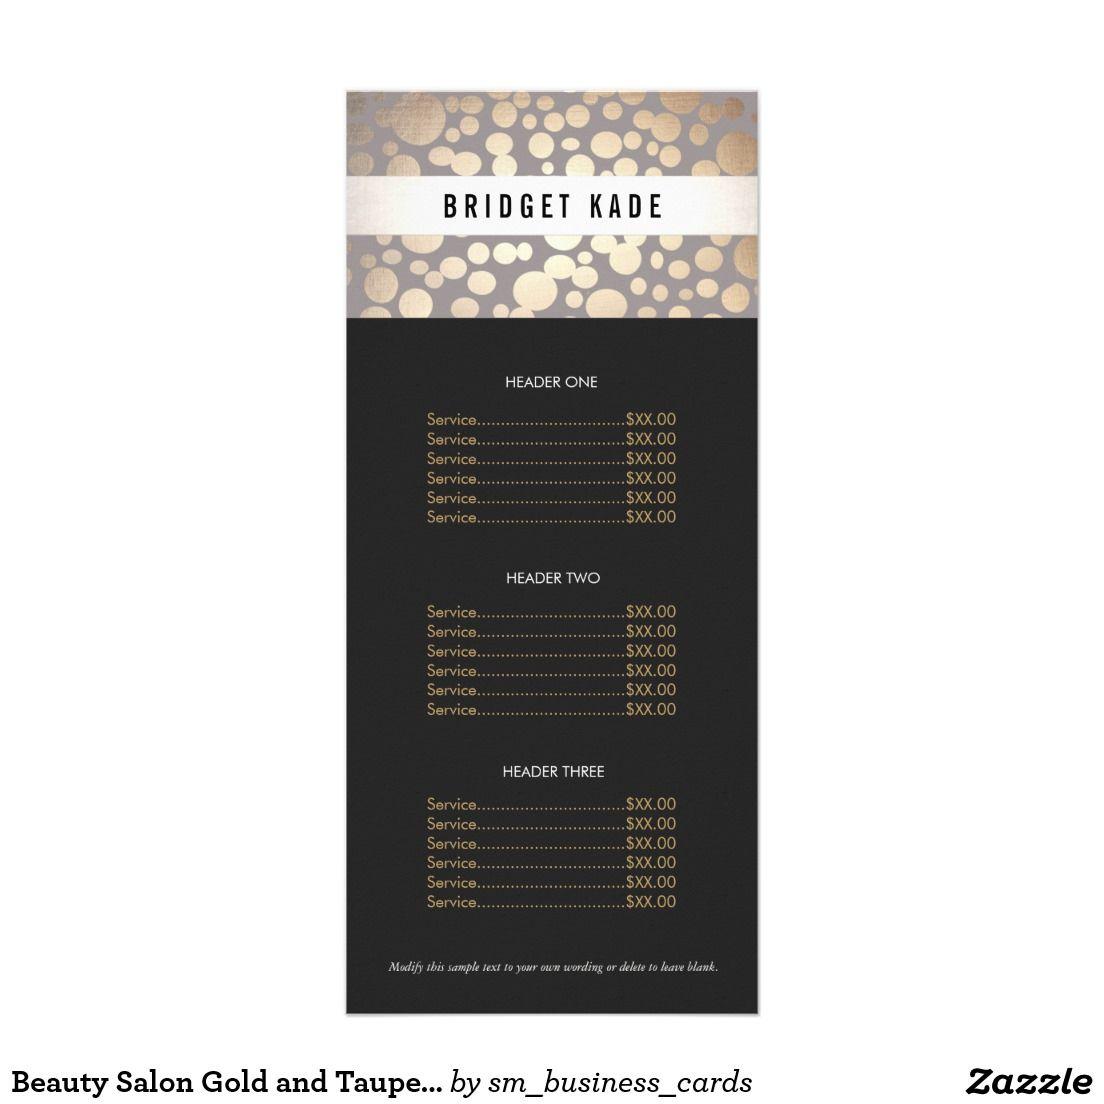 Beauty Salon Gold And Taupe Spotted Pattern Menu  Salon Gold